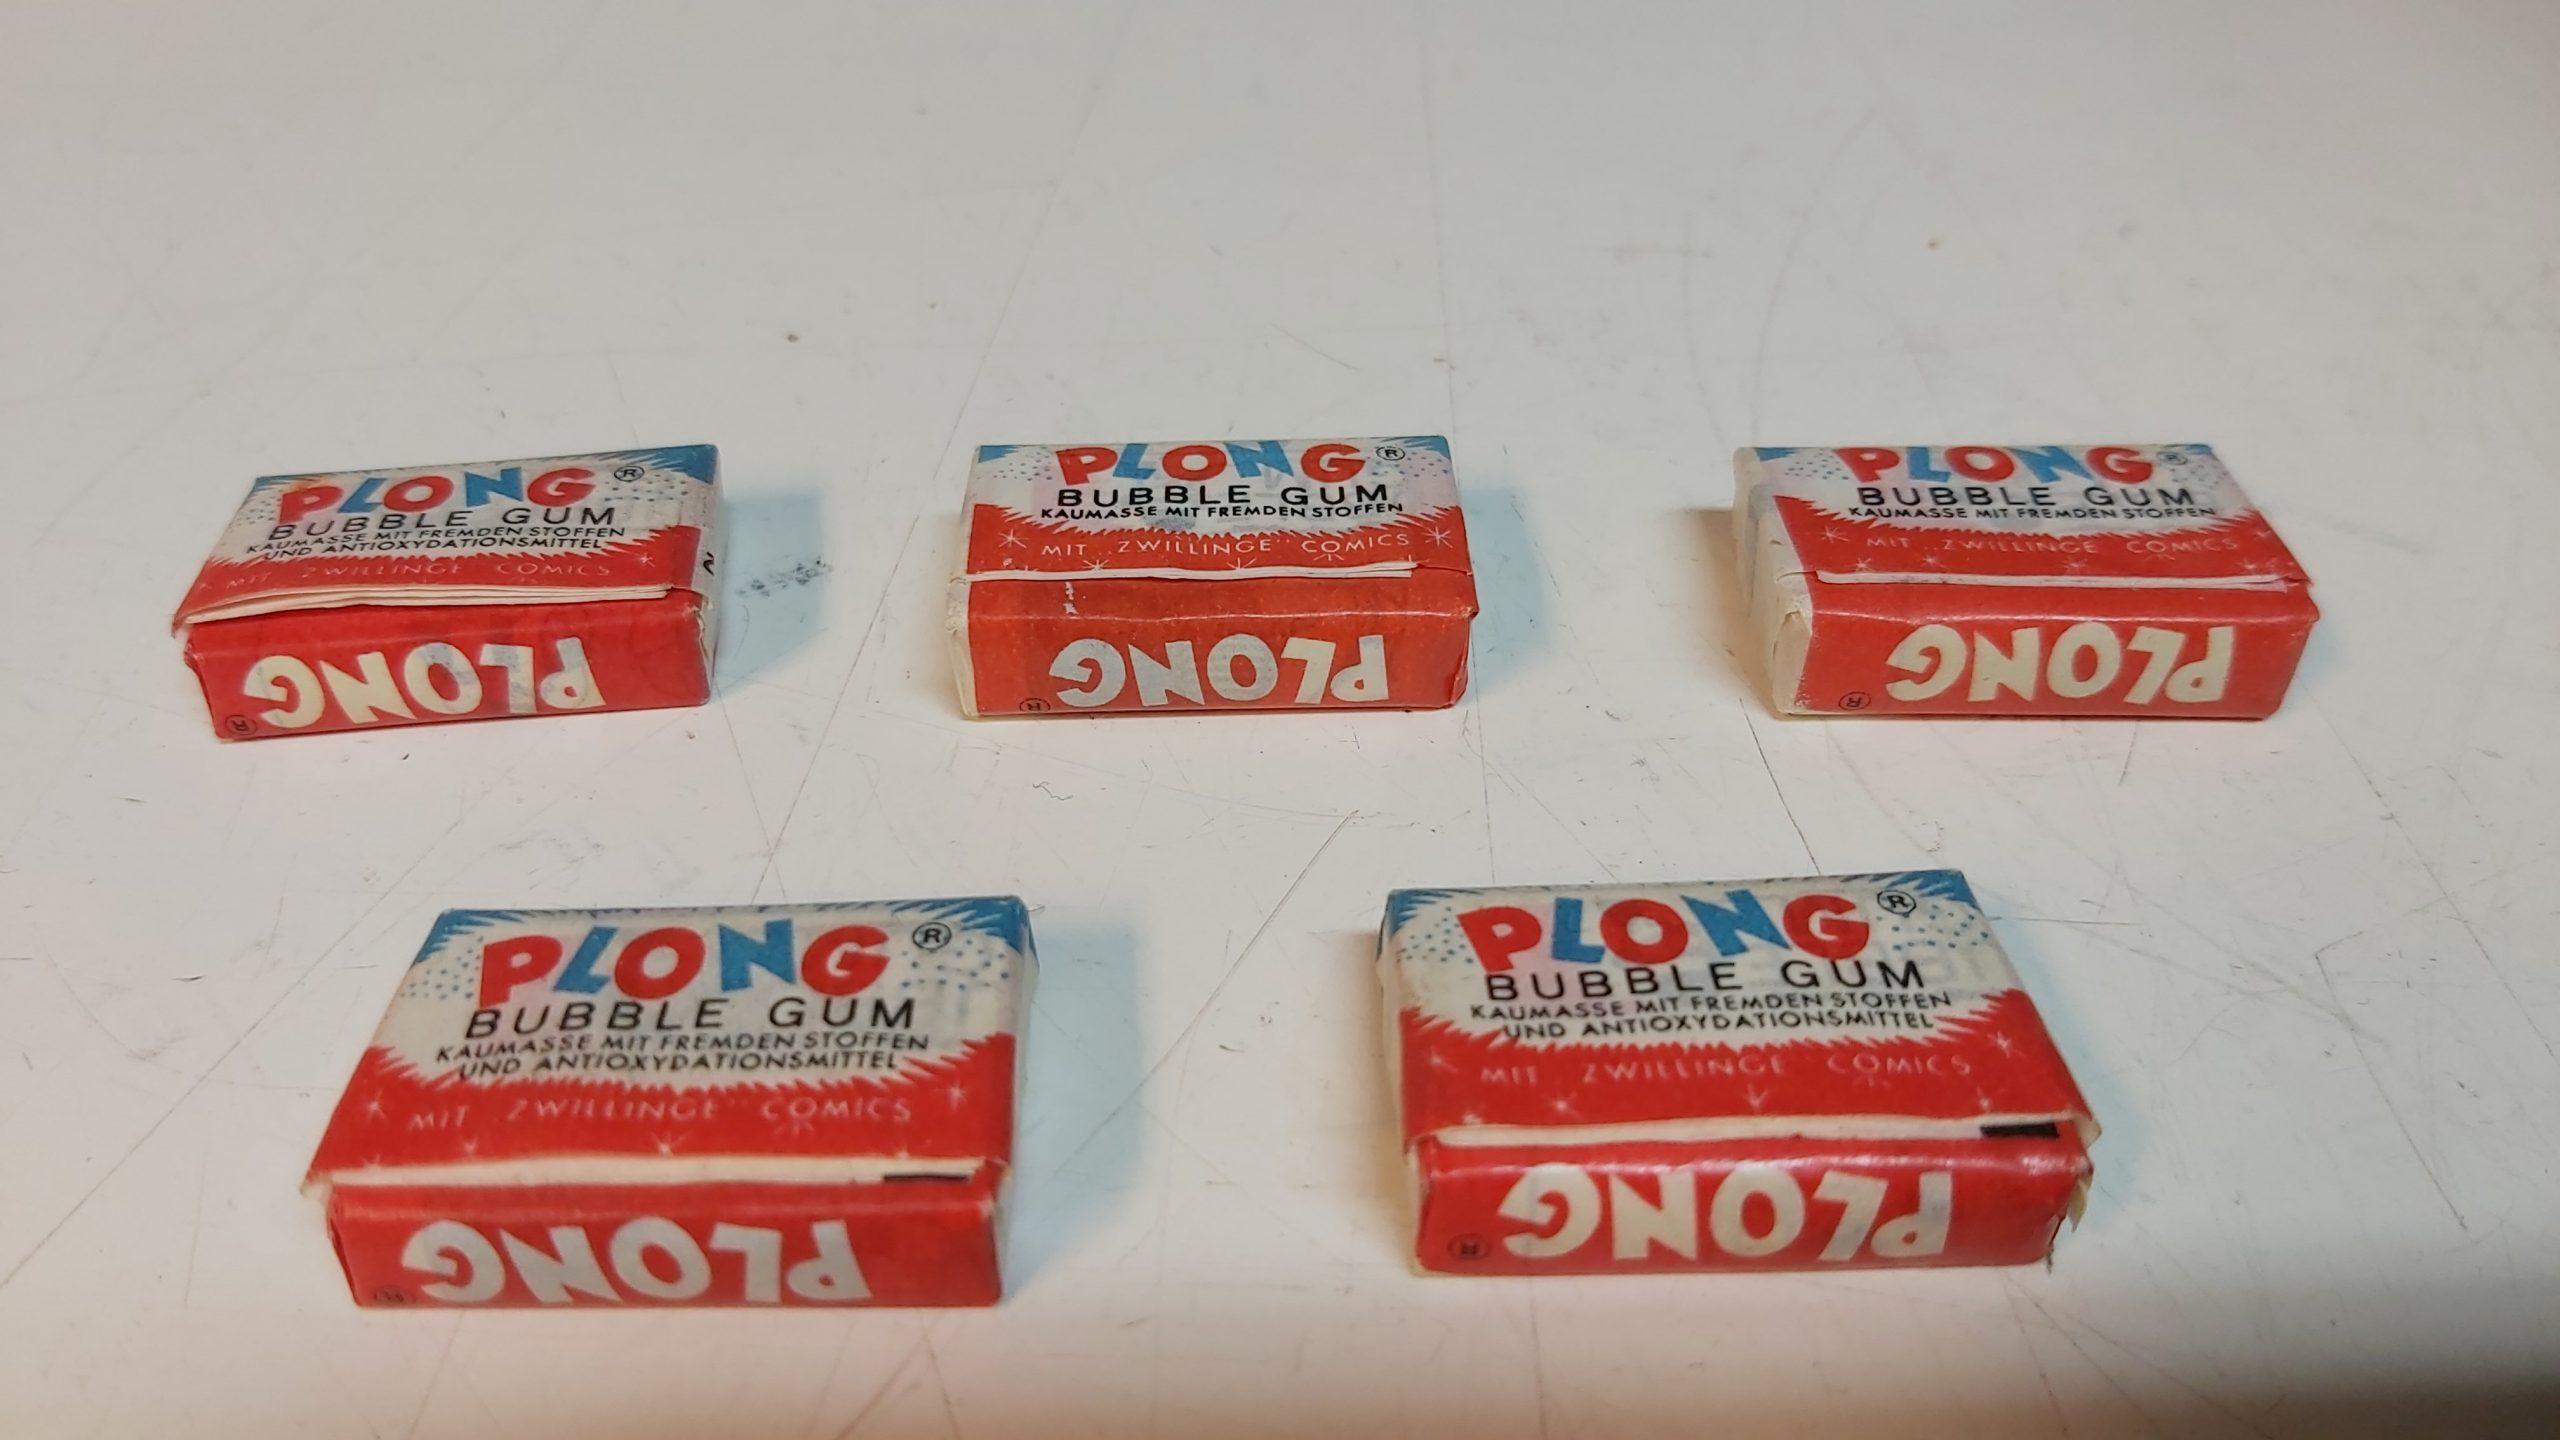 5 Stück alte Plong Gum Kaugummis für Warenautomat